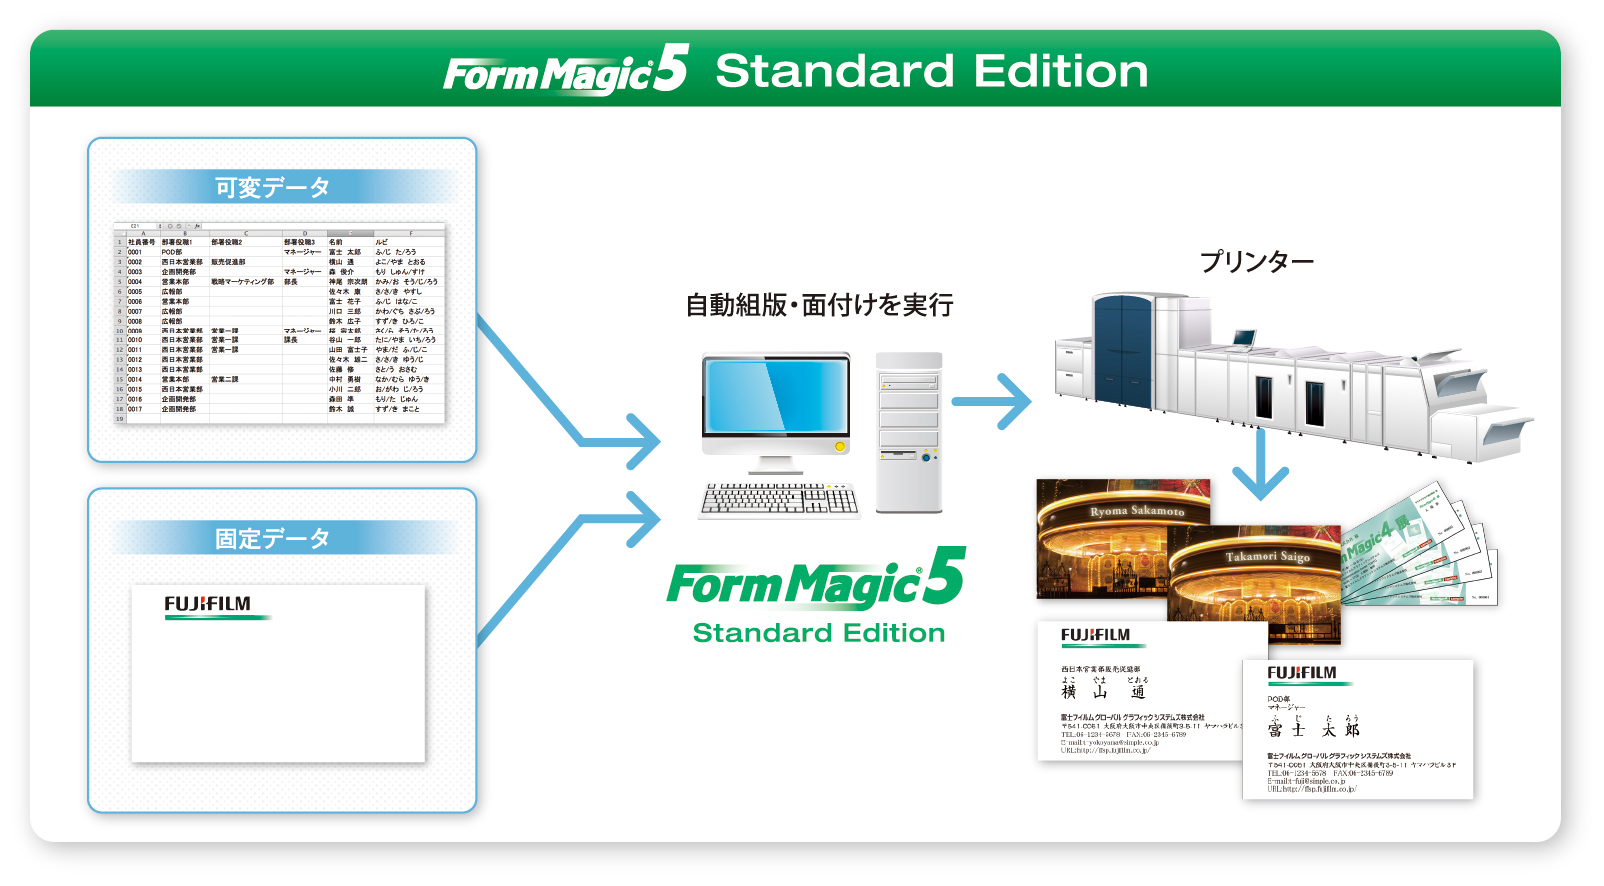 FormMagic5 Standard Edition